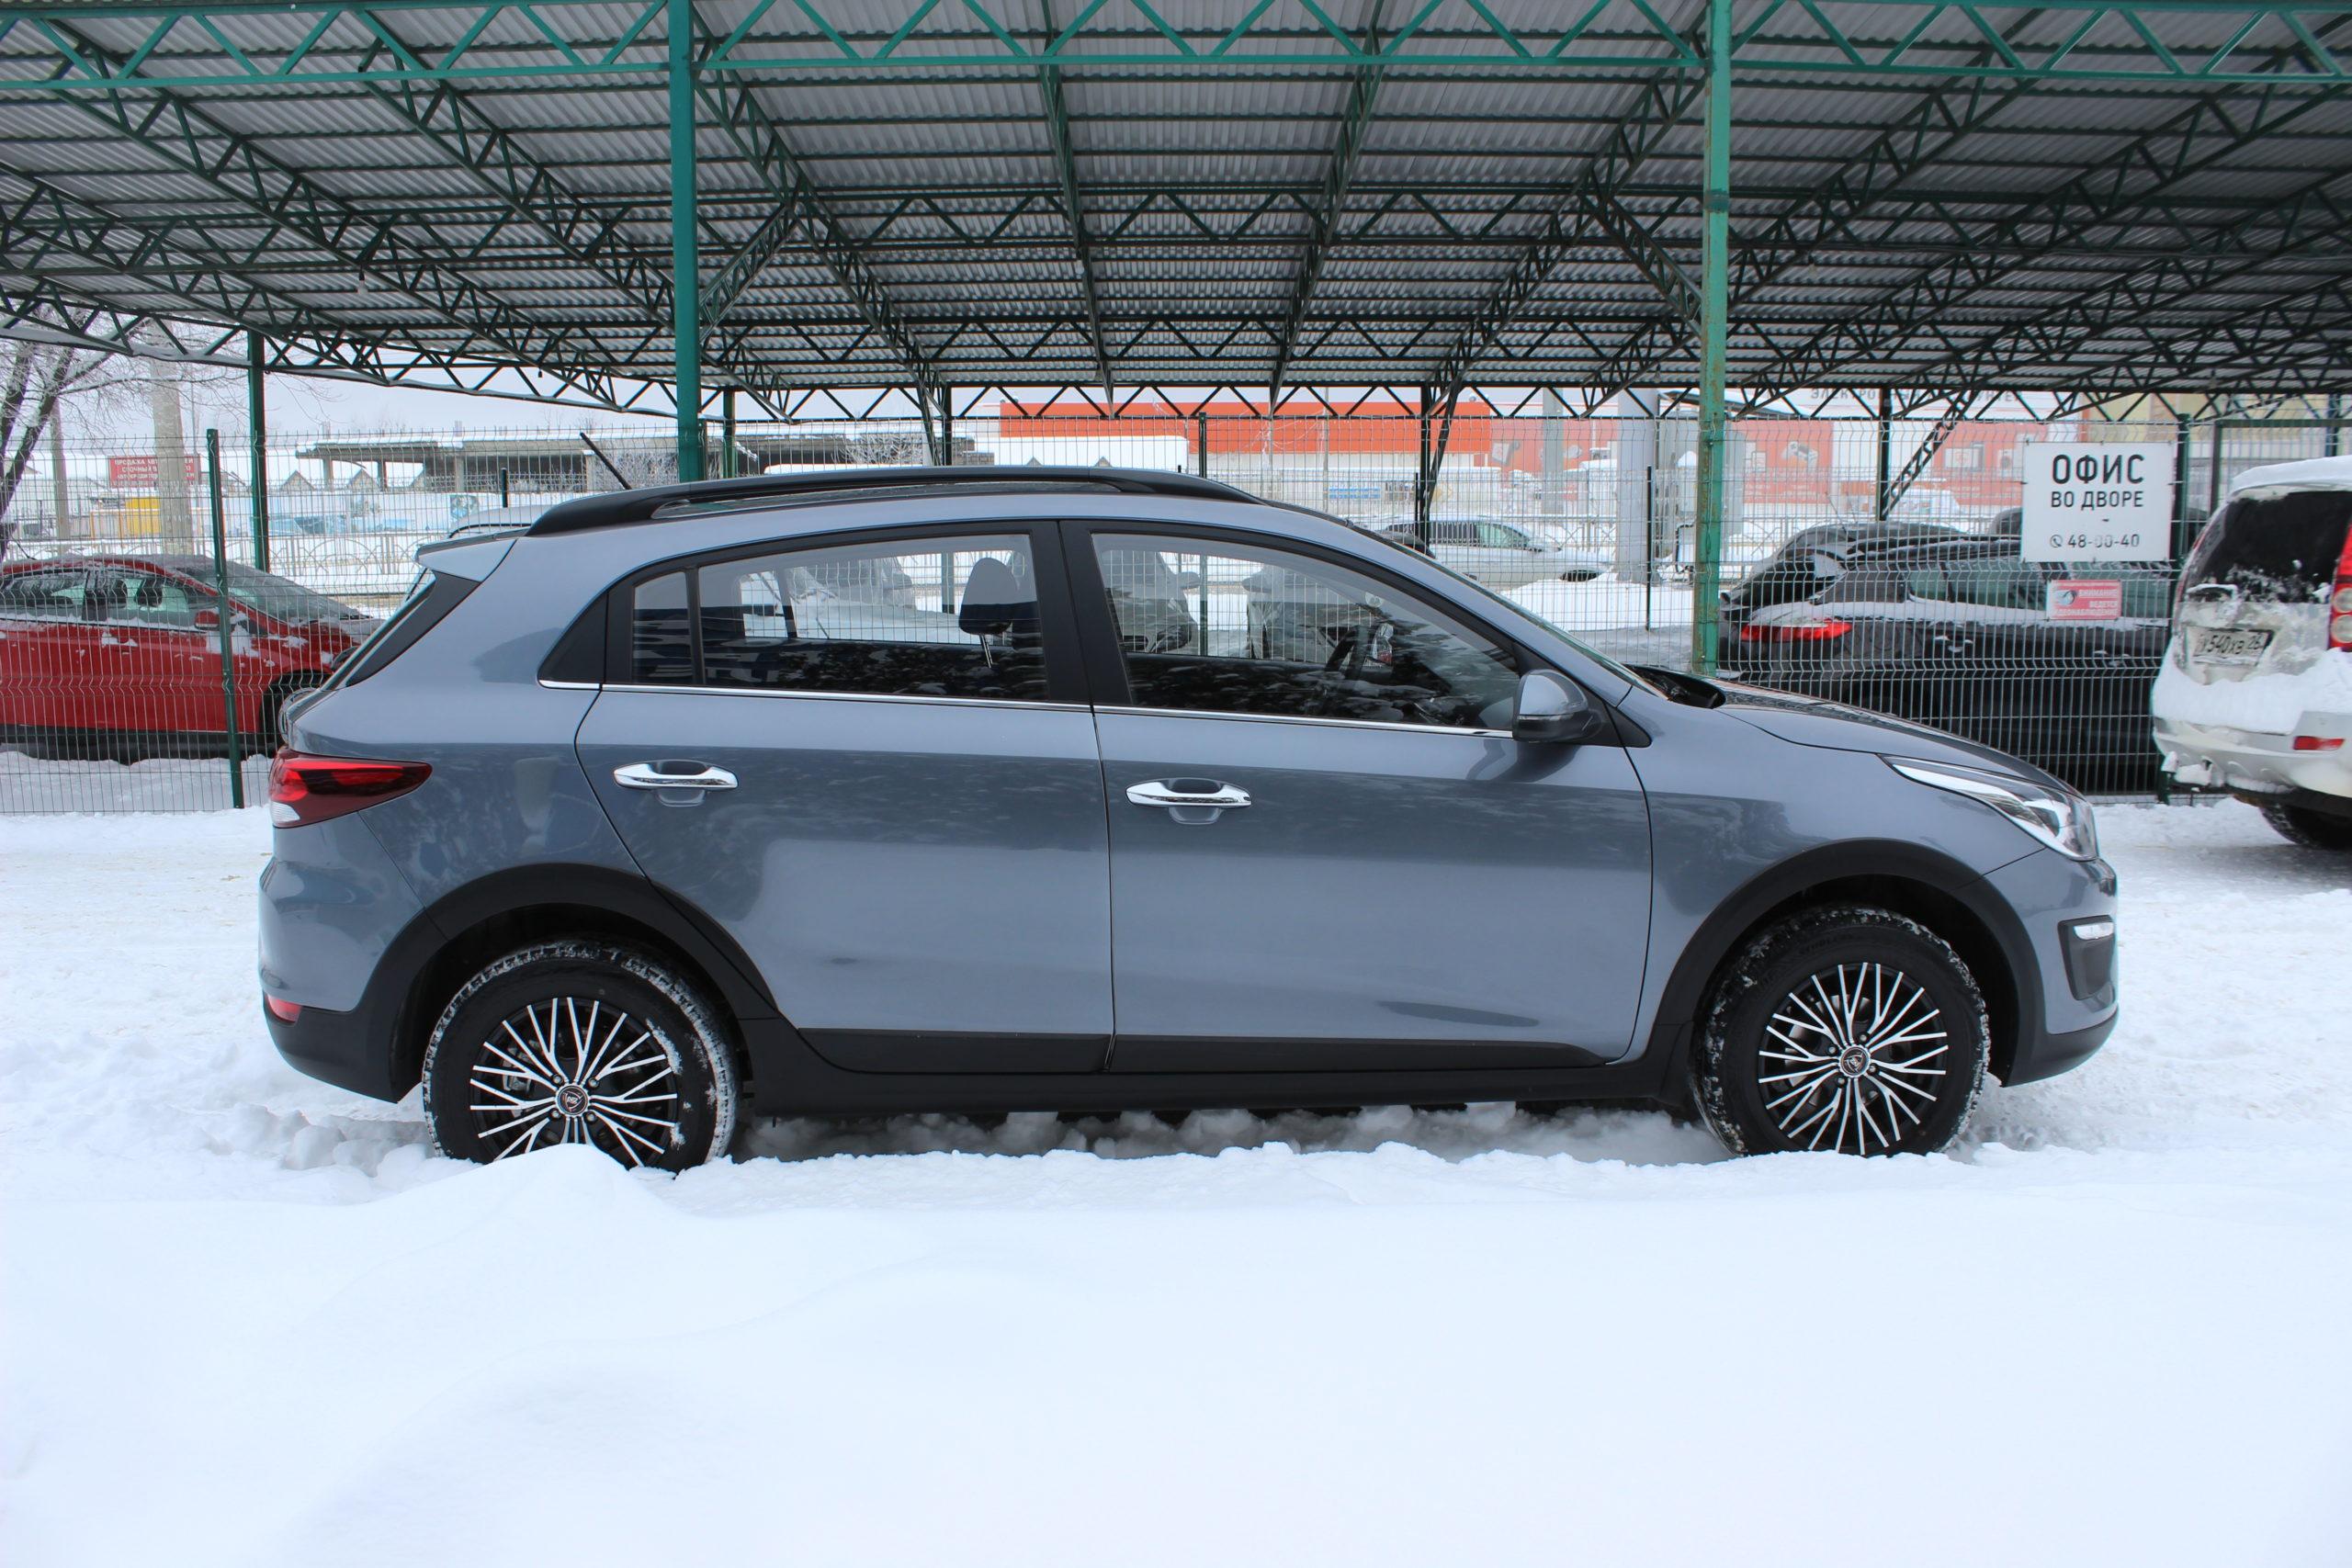 Купить KIA Rio X-Line (Серый) - Автопарк Ставрополь